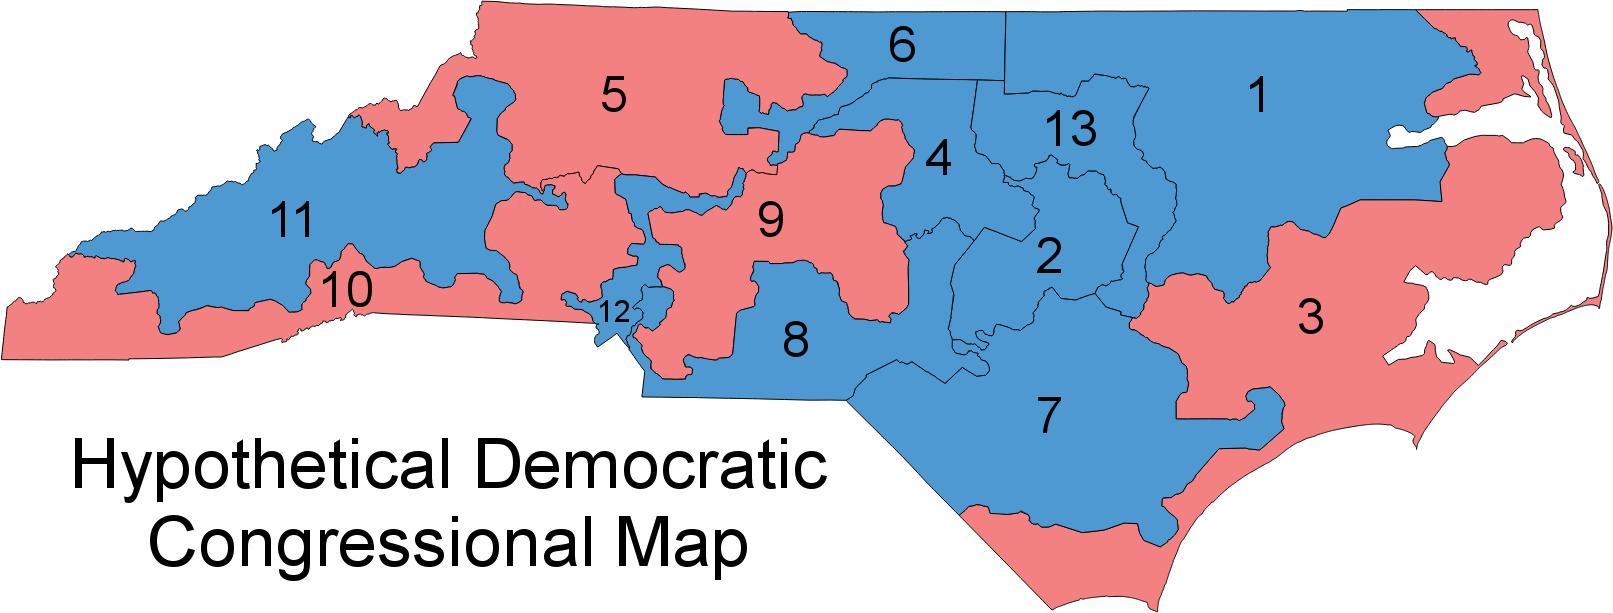 building up redistricting data for North Carolina (tecznotes)